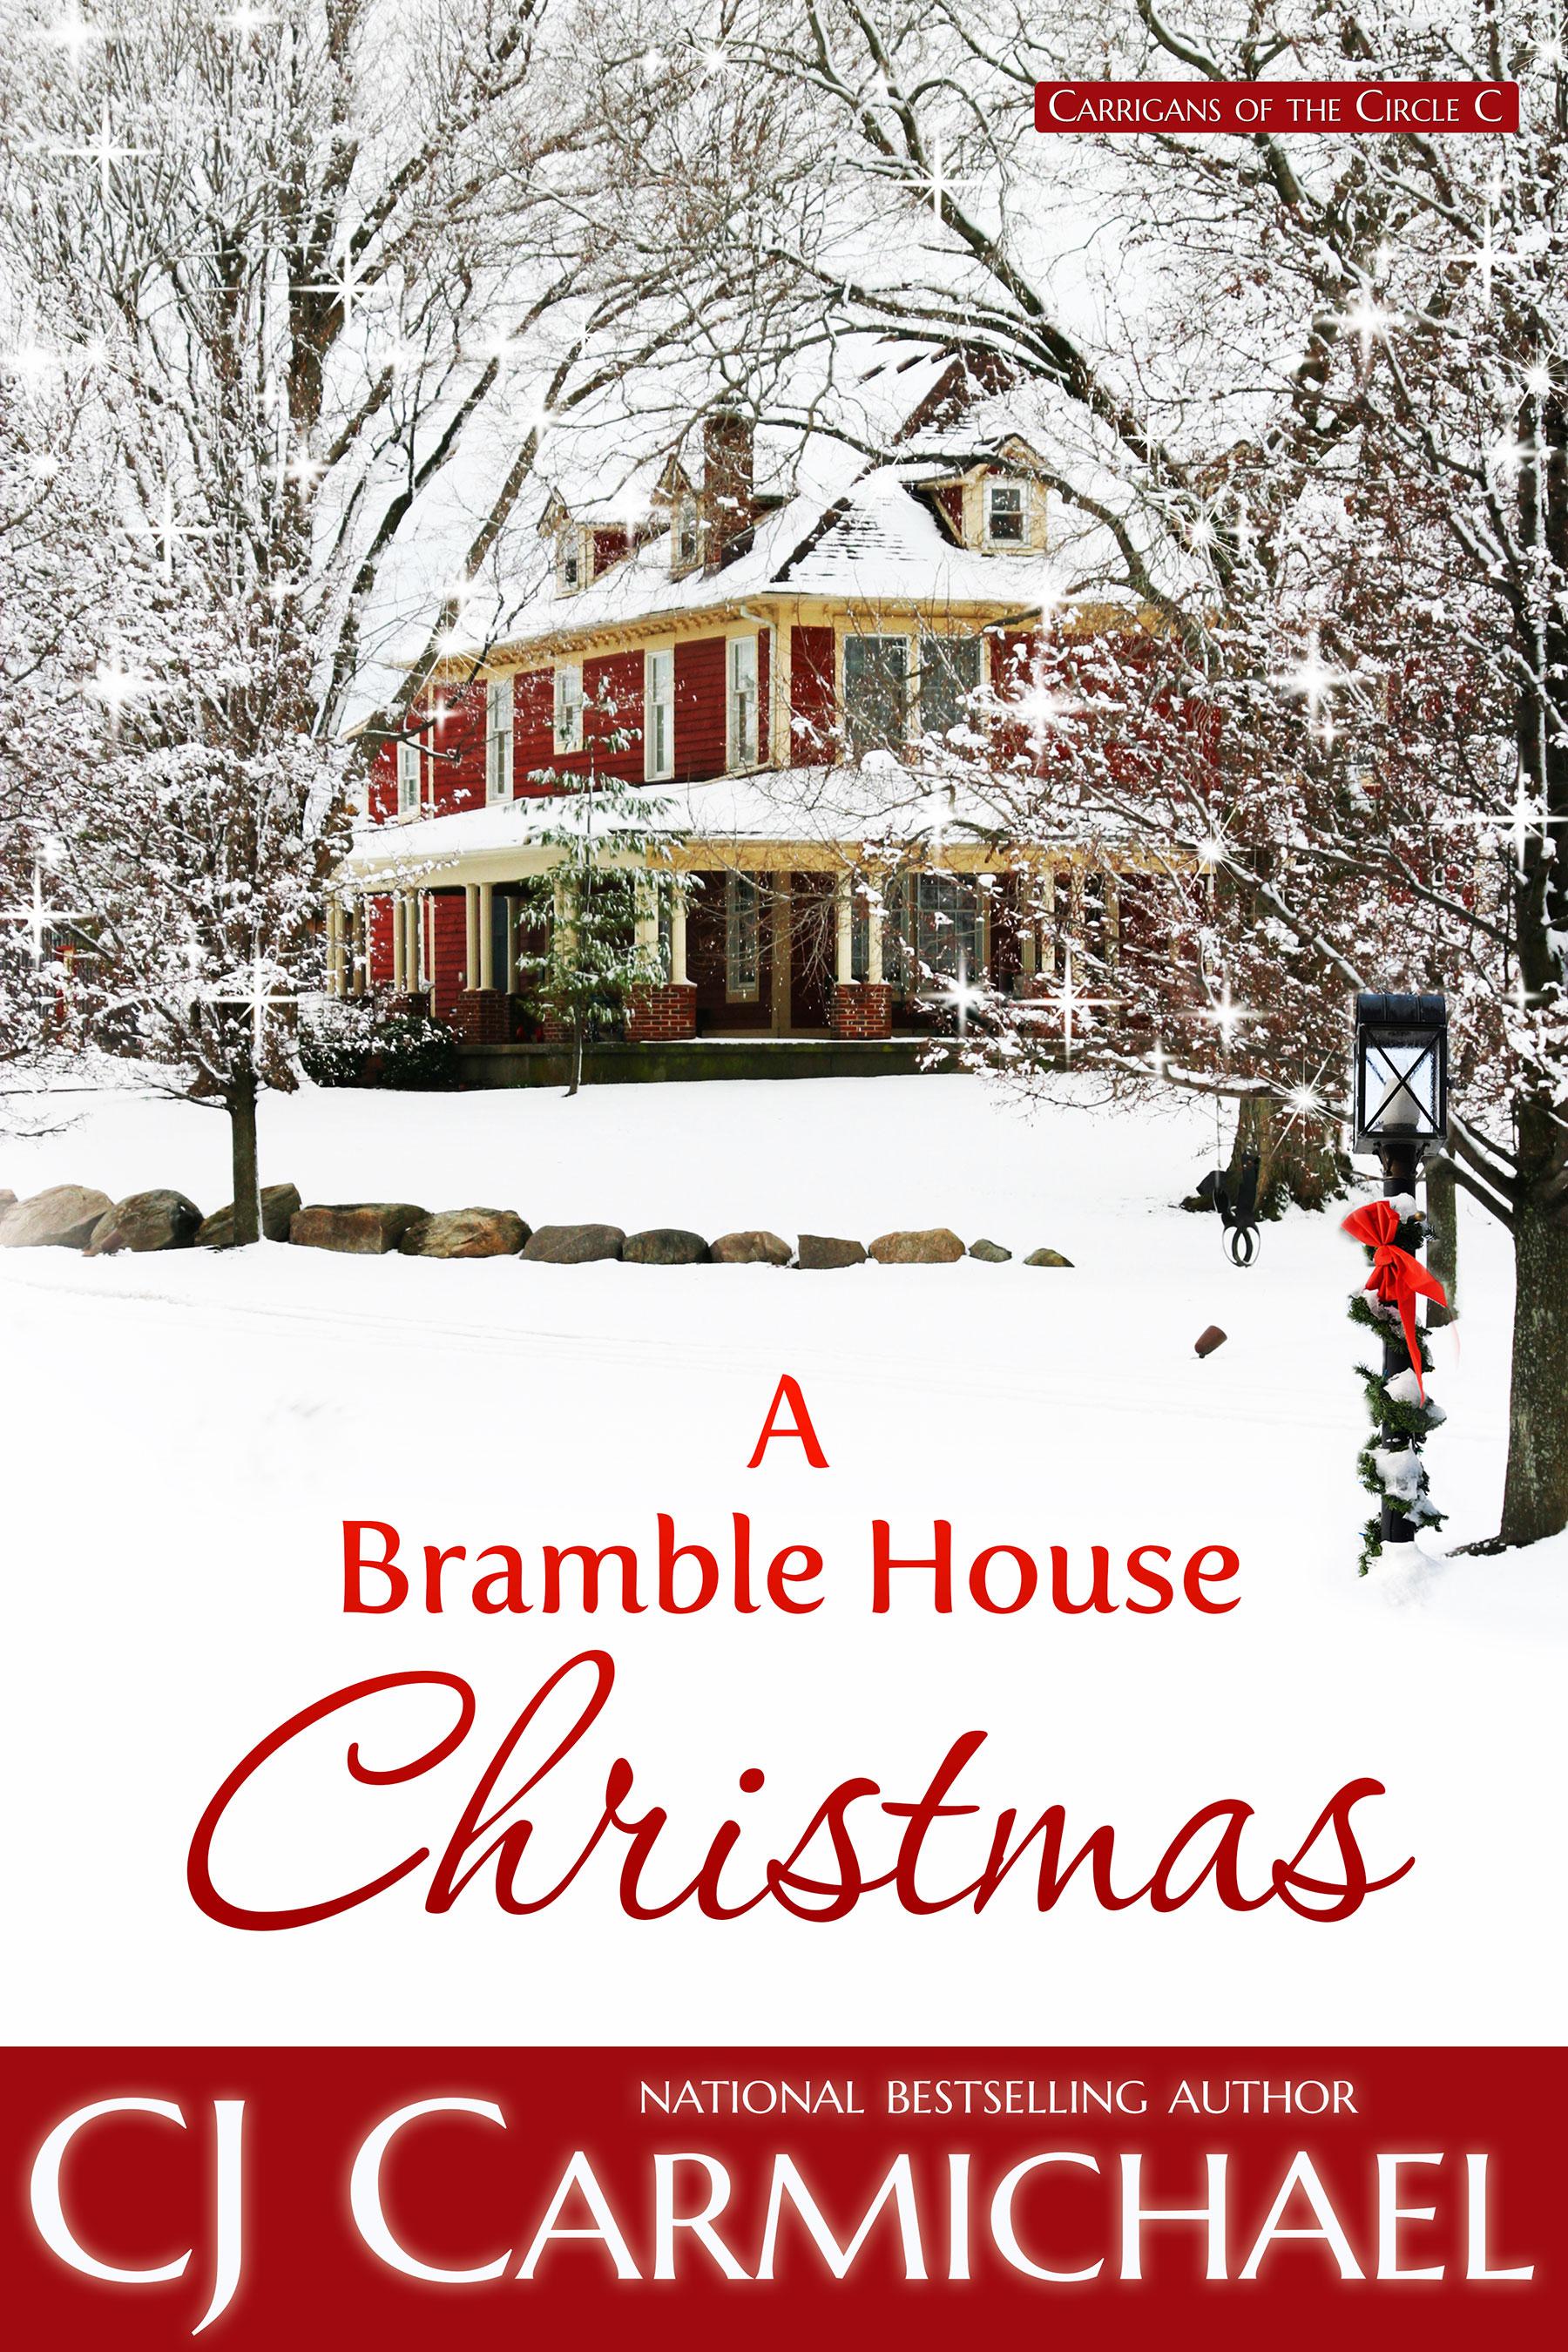 Bramble House Christmas.A Bramble House Christmas An Ebook By Cj Carmichael